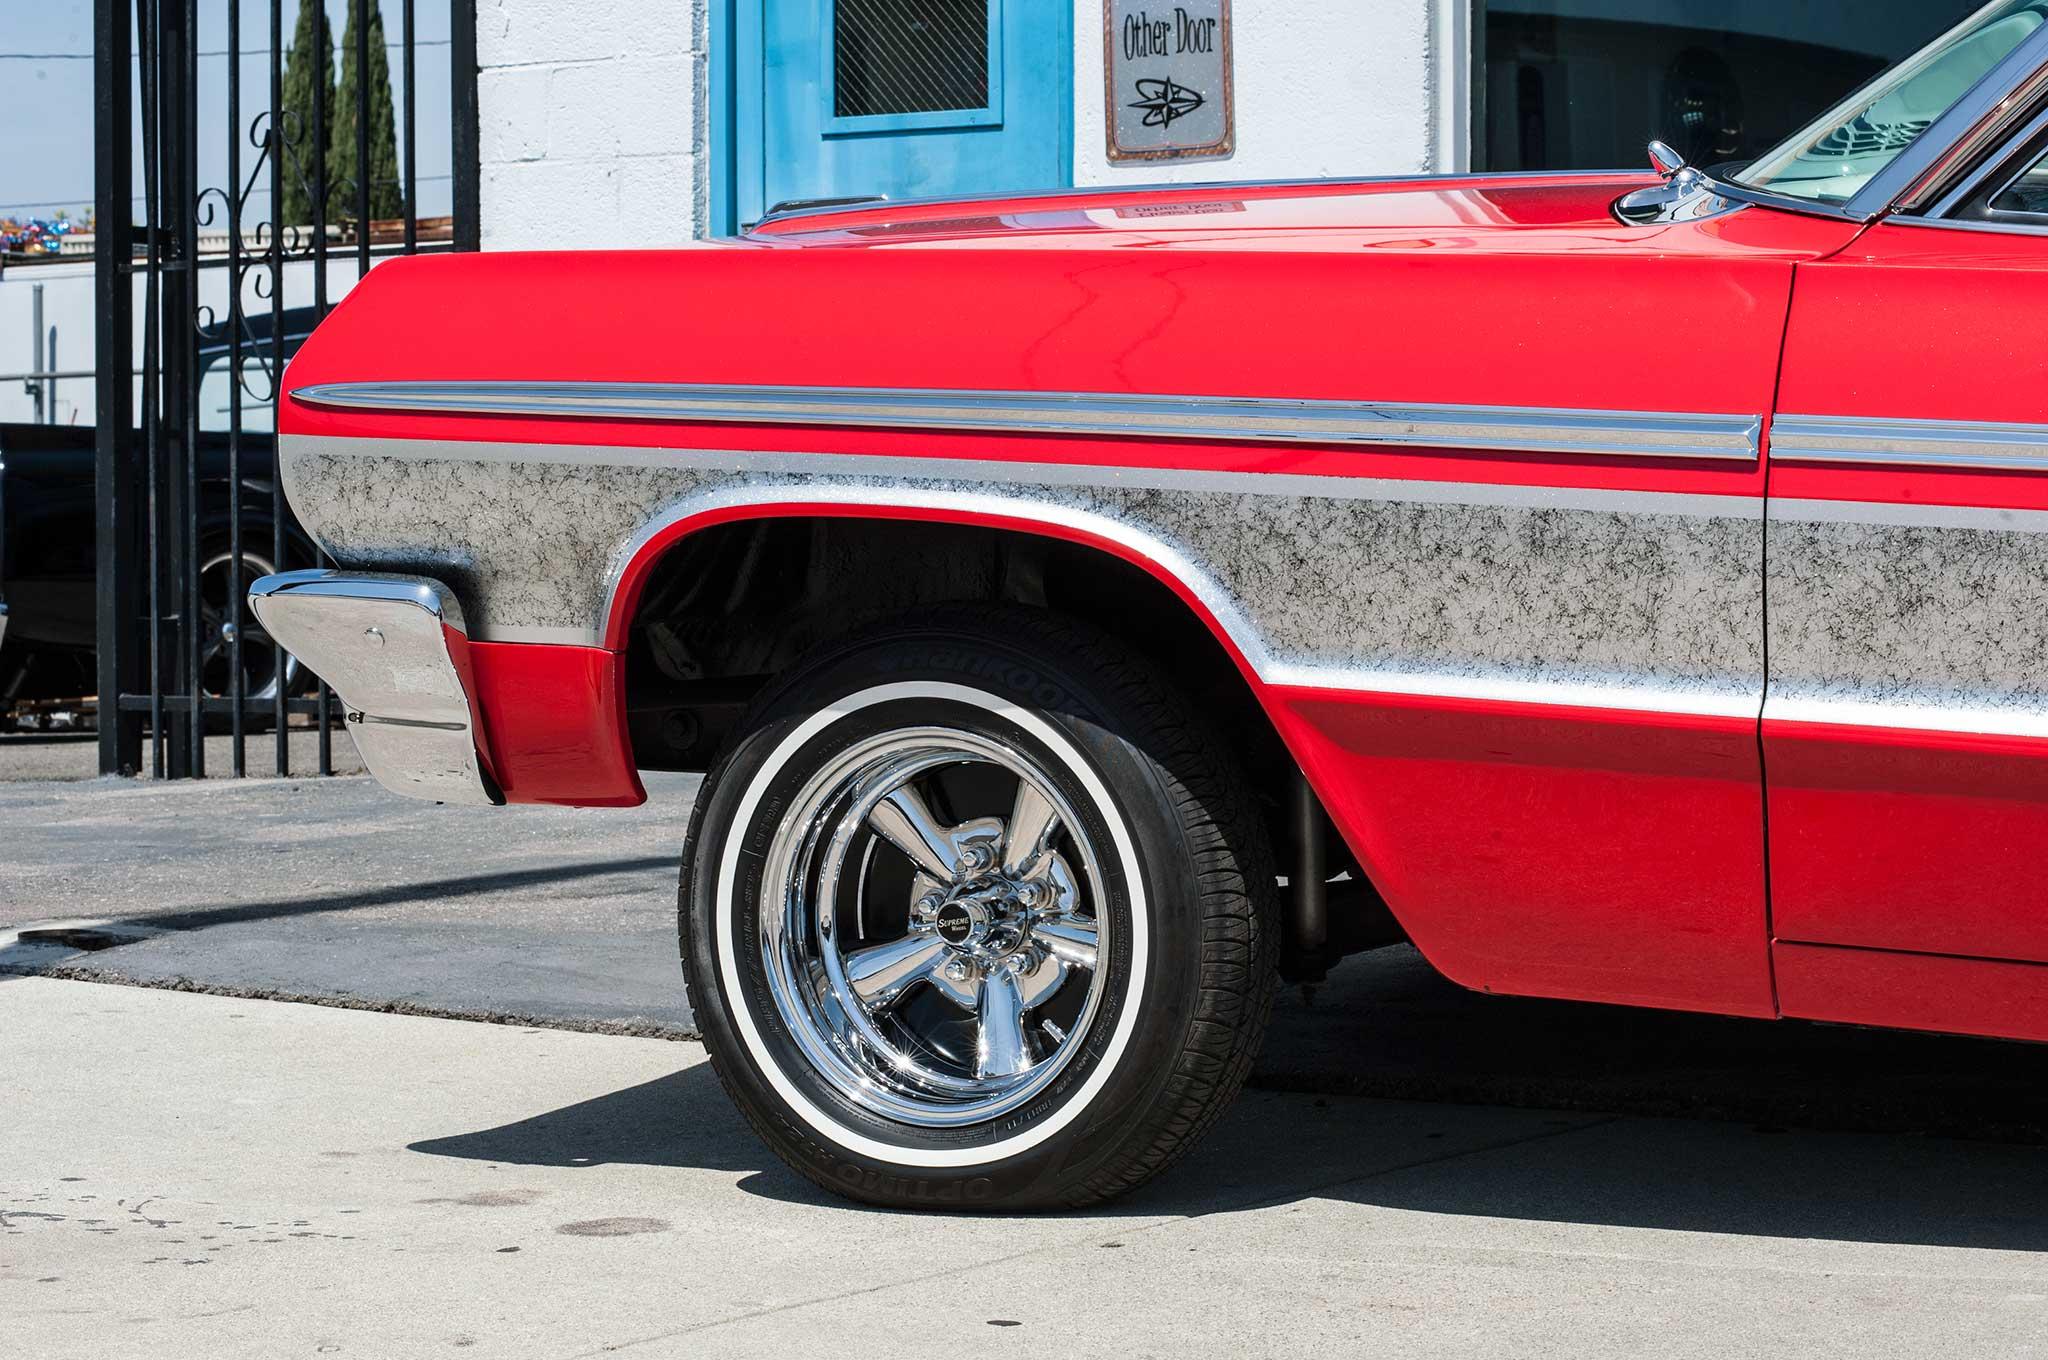 1964-chevrolet-impala-astro-supreme-wheel - Lowrider